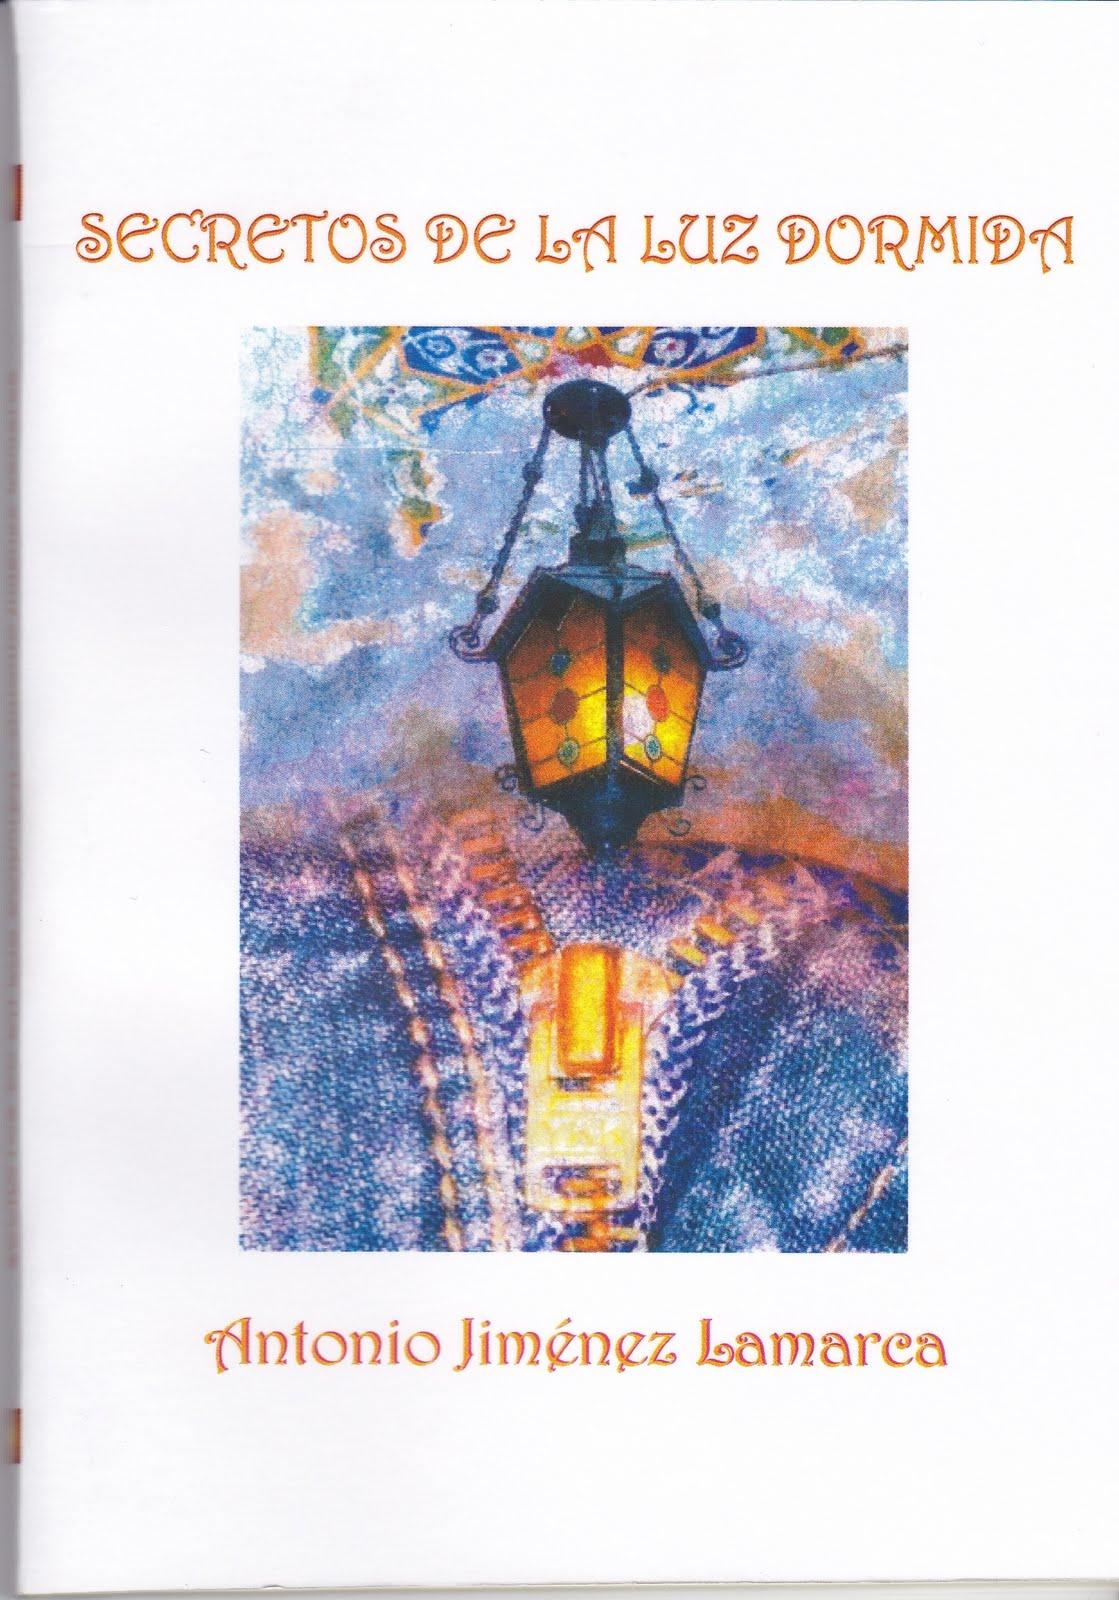 http://2.bp.blogspot.com/_X4sKDl7W10w/TA_cJQADTuI/AAAAAAAAARs/6Lf3z67ZX_E/s1600/secretos+de+la+luz+dormida.JPG